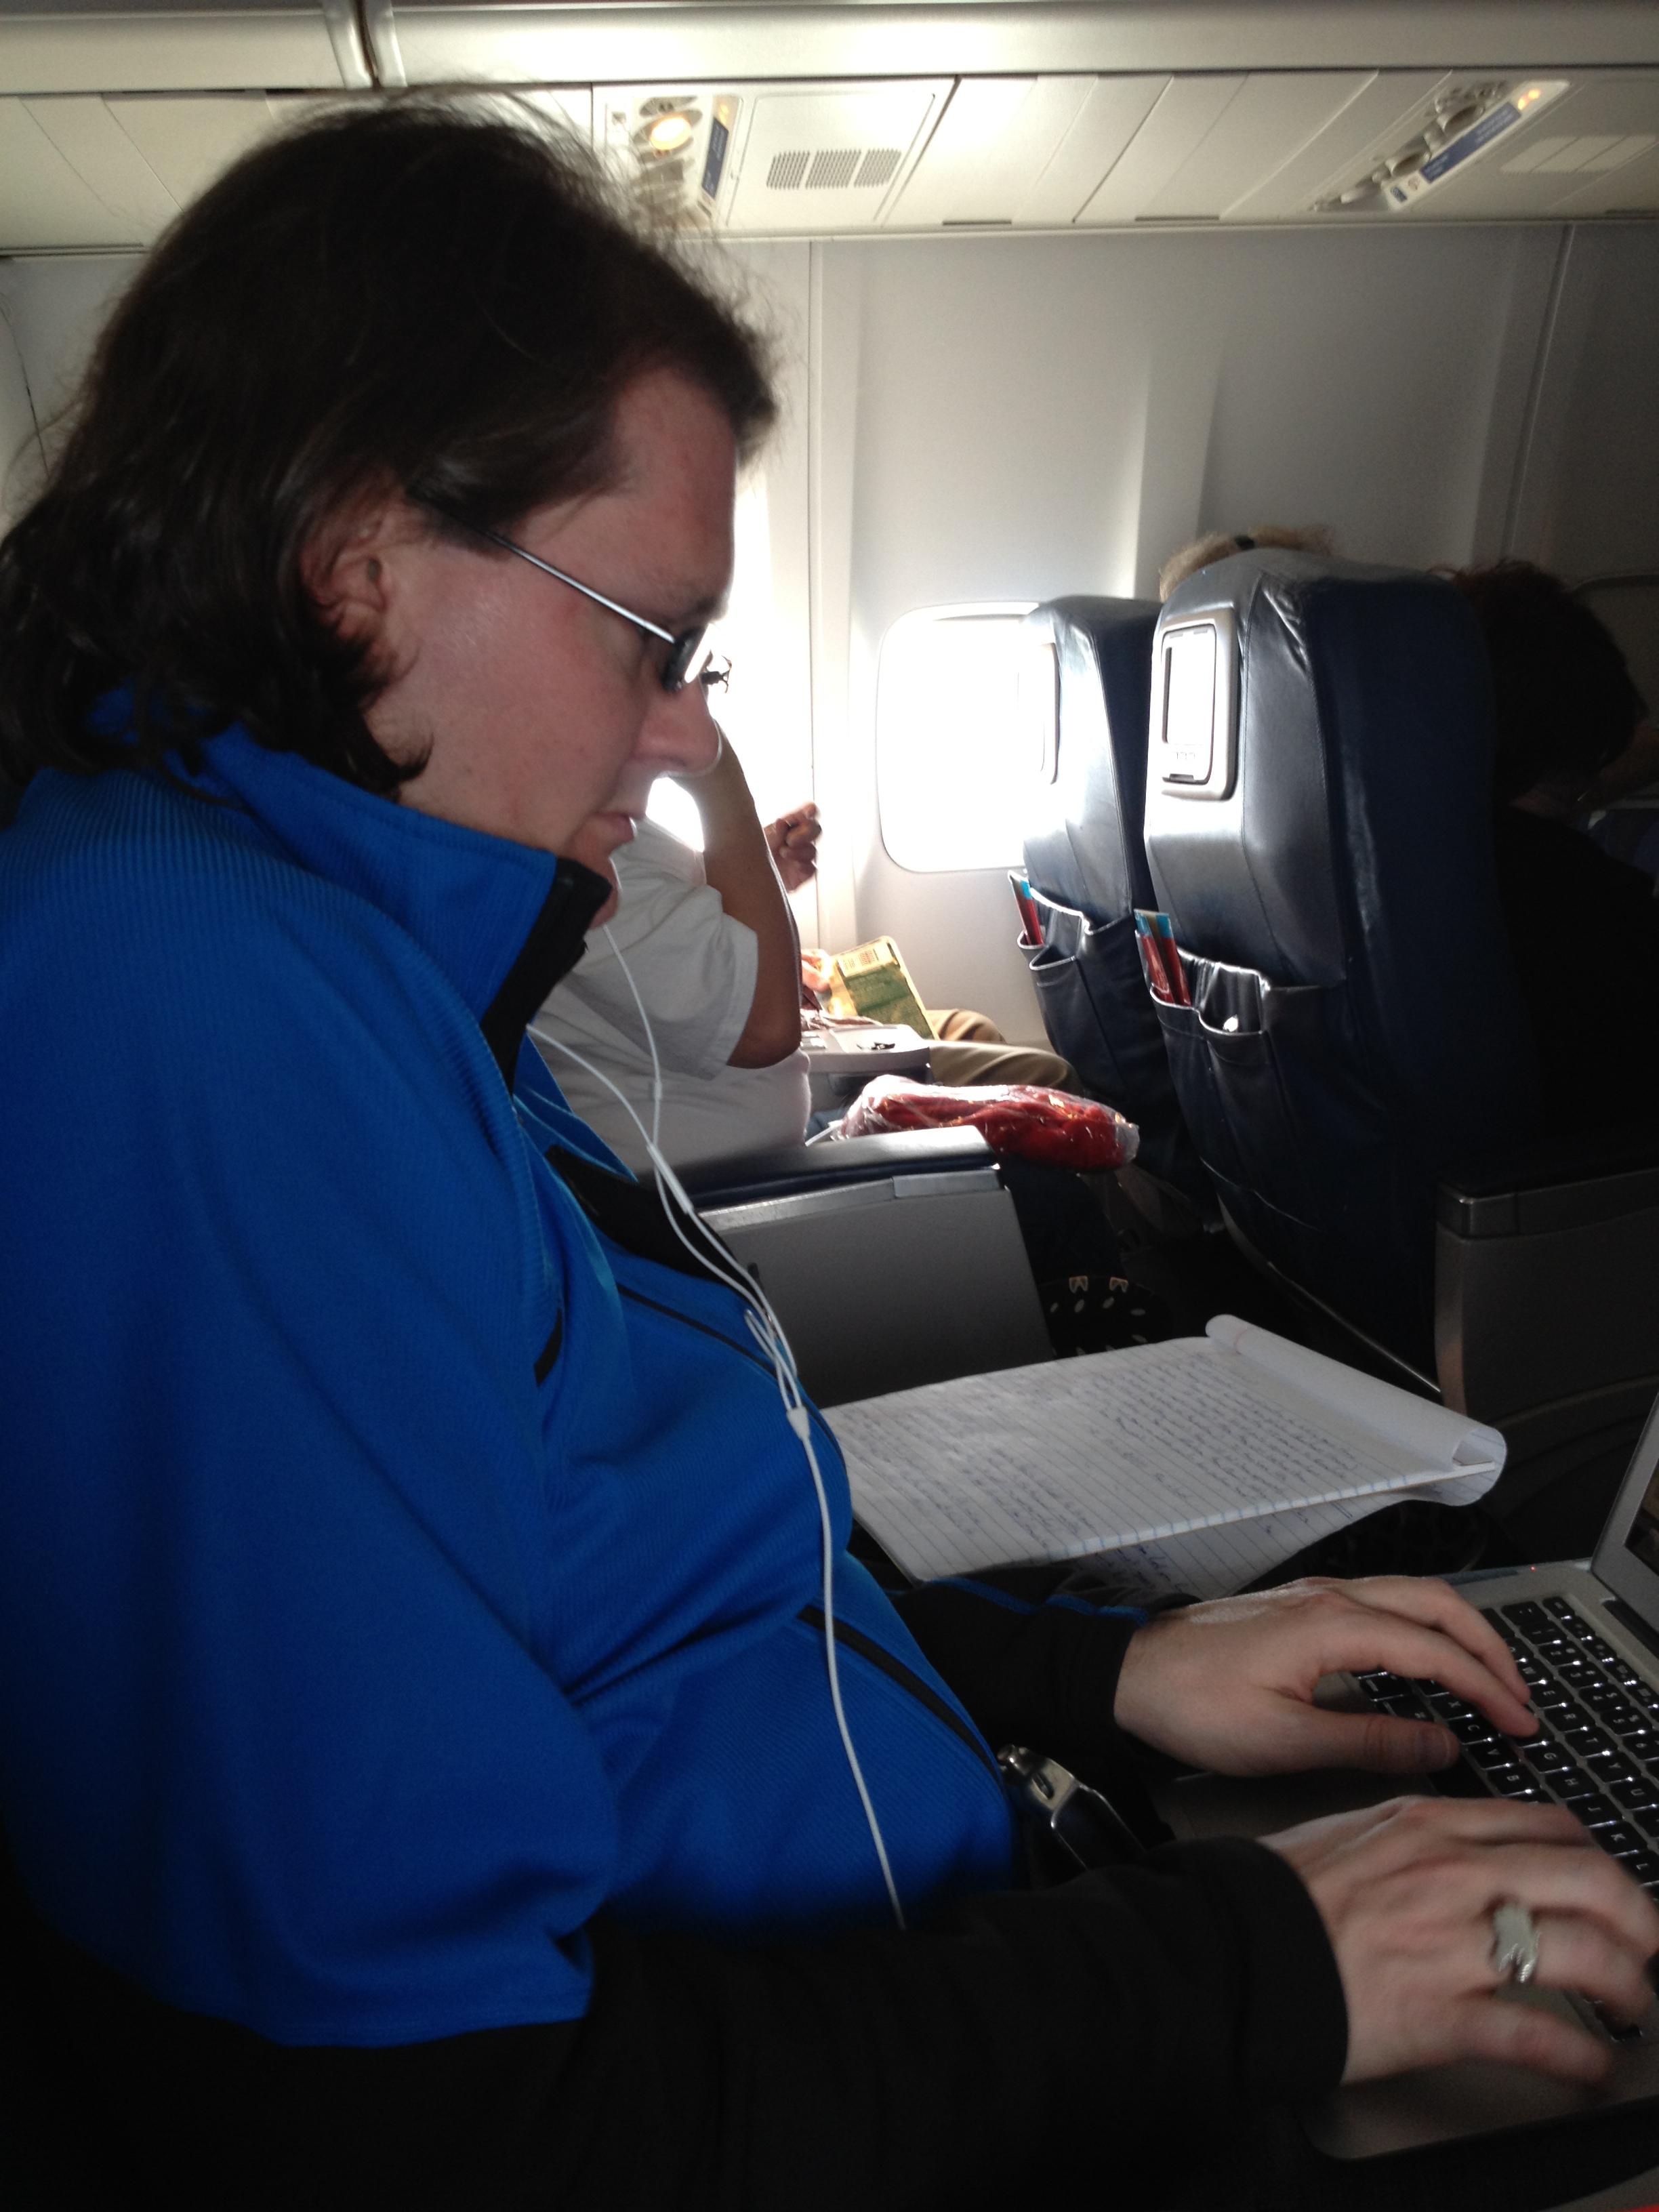 Robert works on the plane - Bermuda 2012